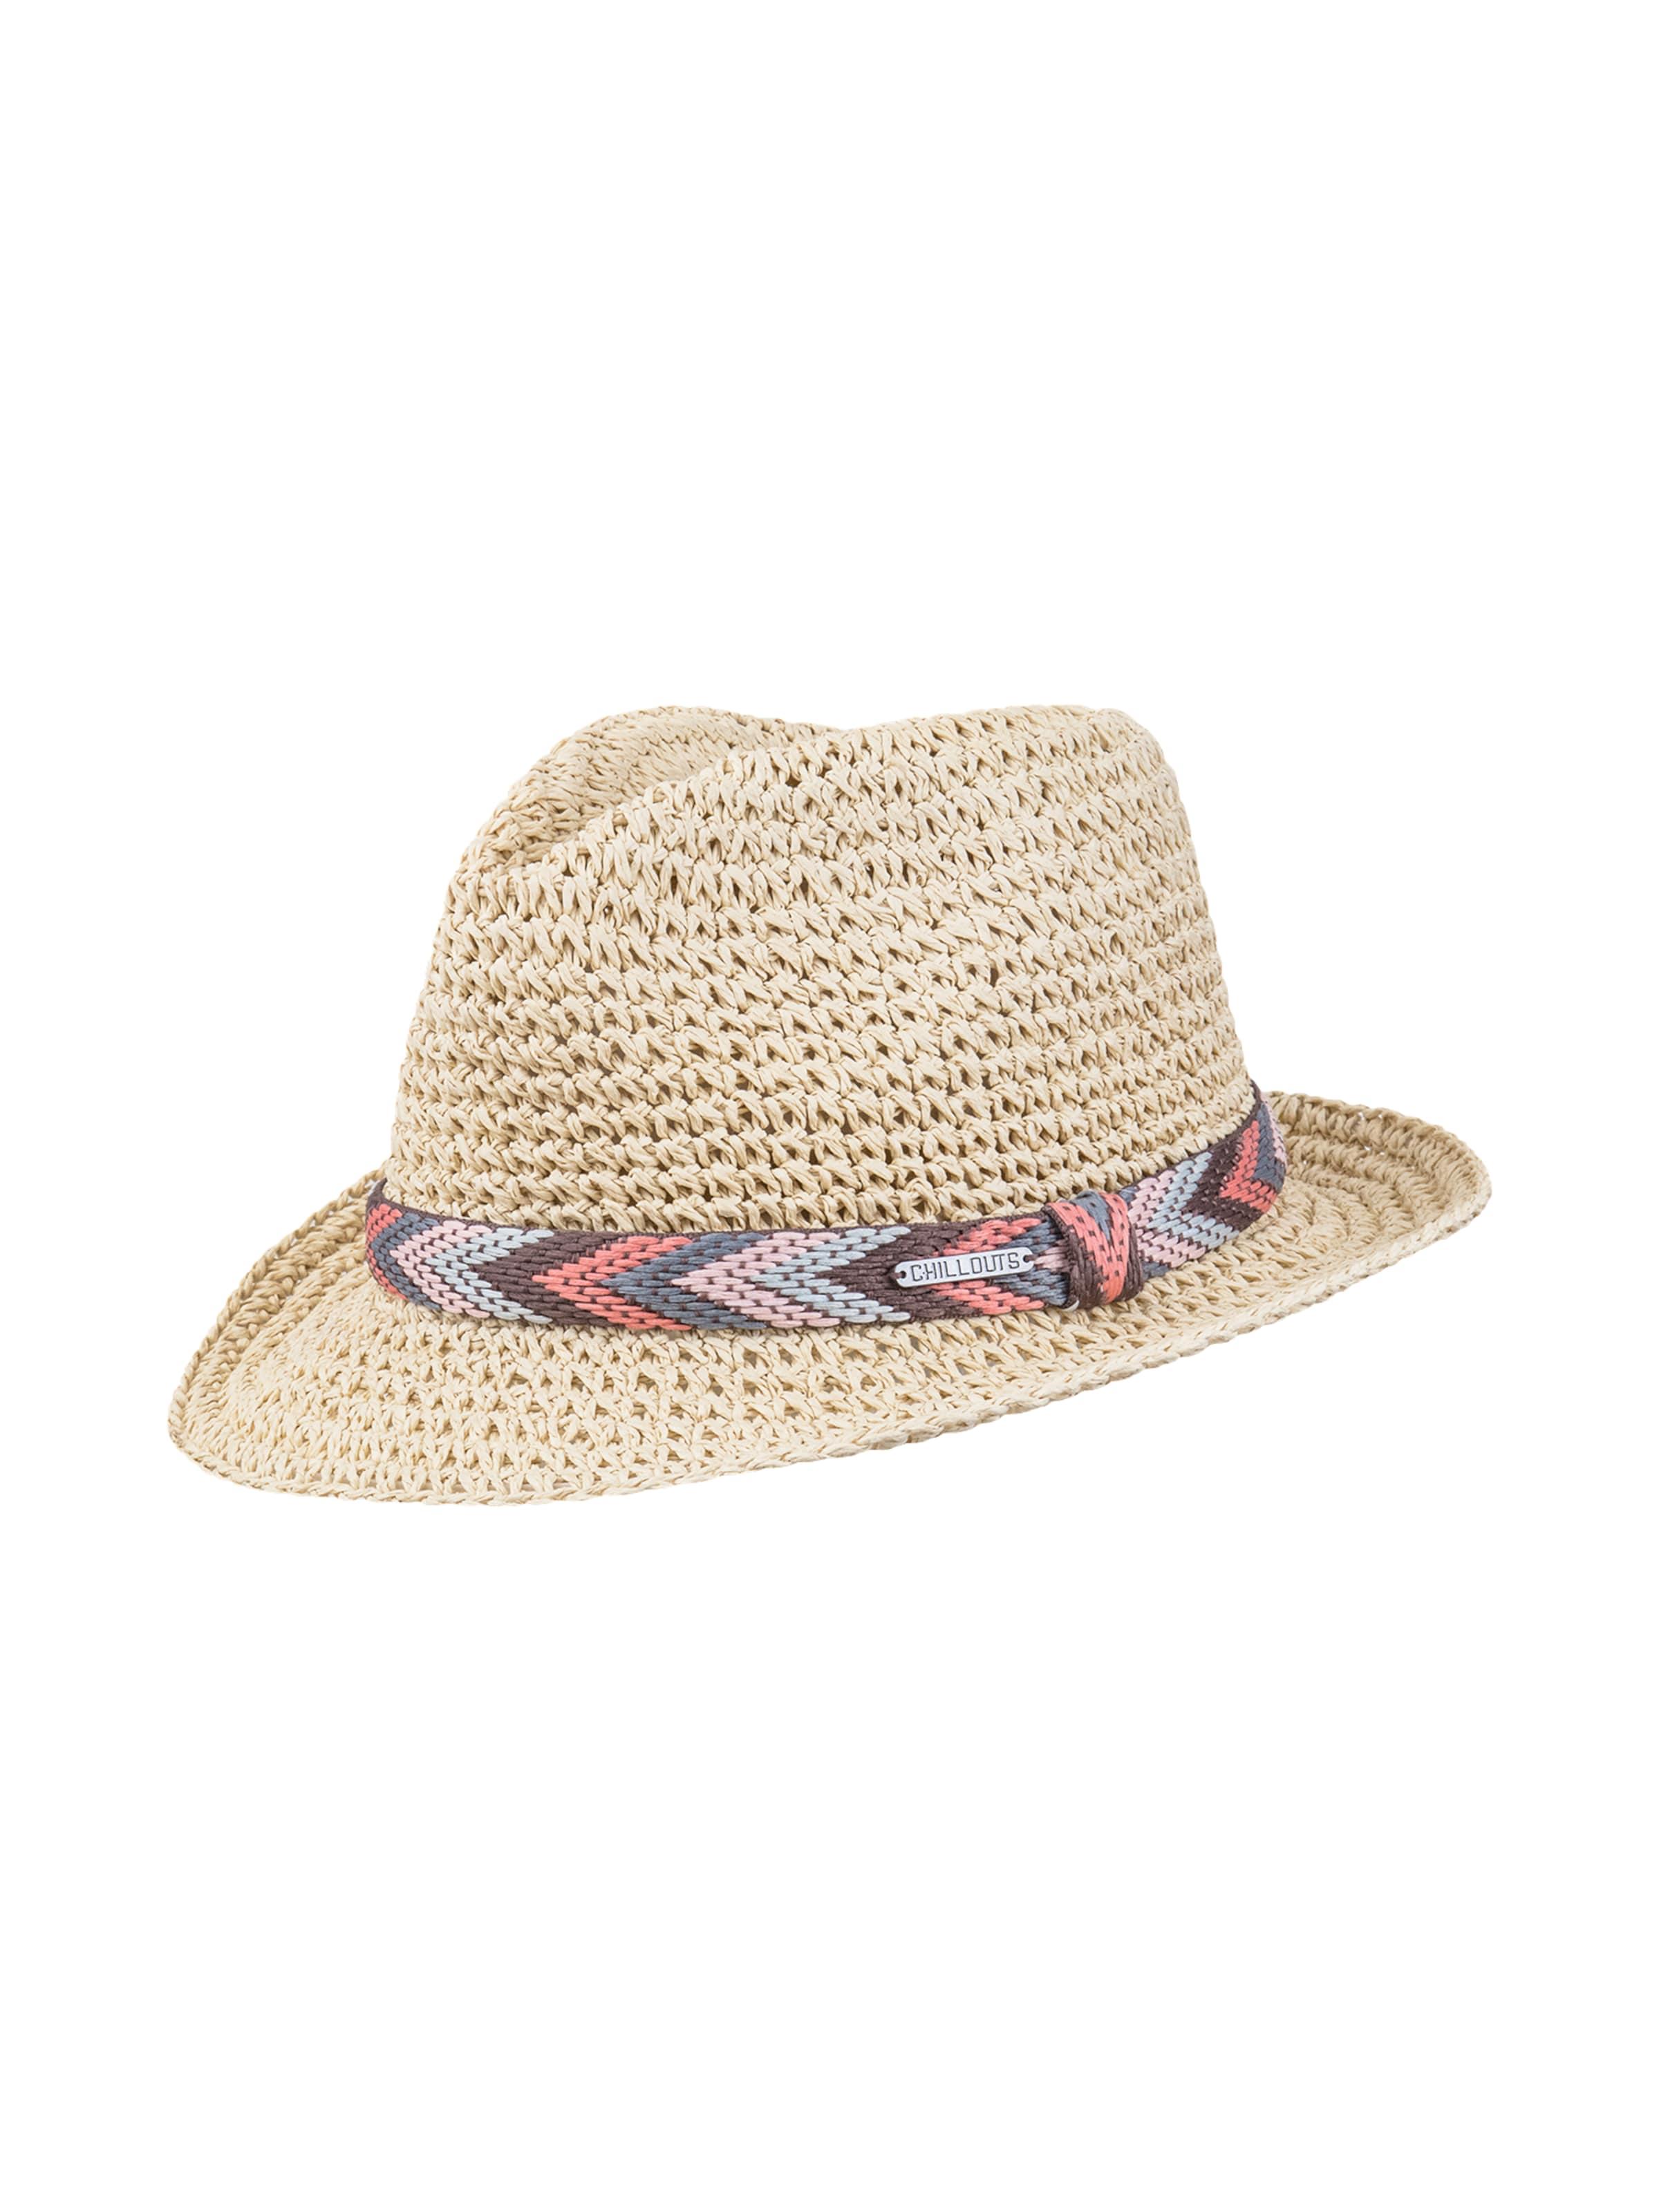 Chapeaux 'medellin Hat' Chillouts Gris En v8Owmn0N